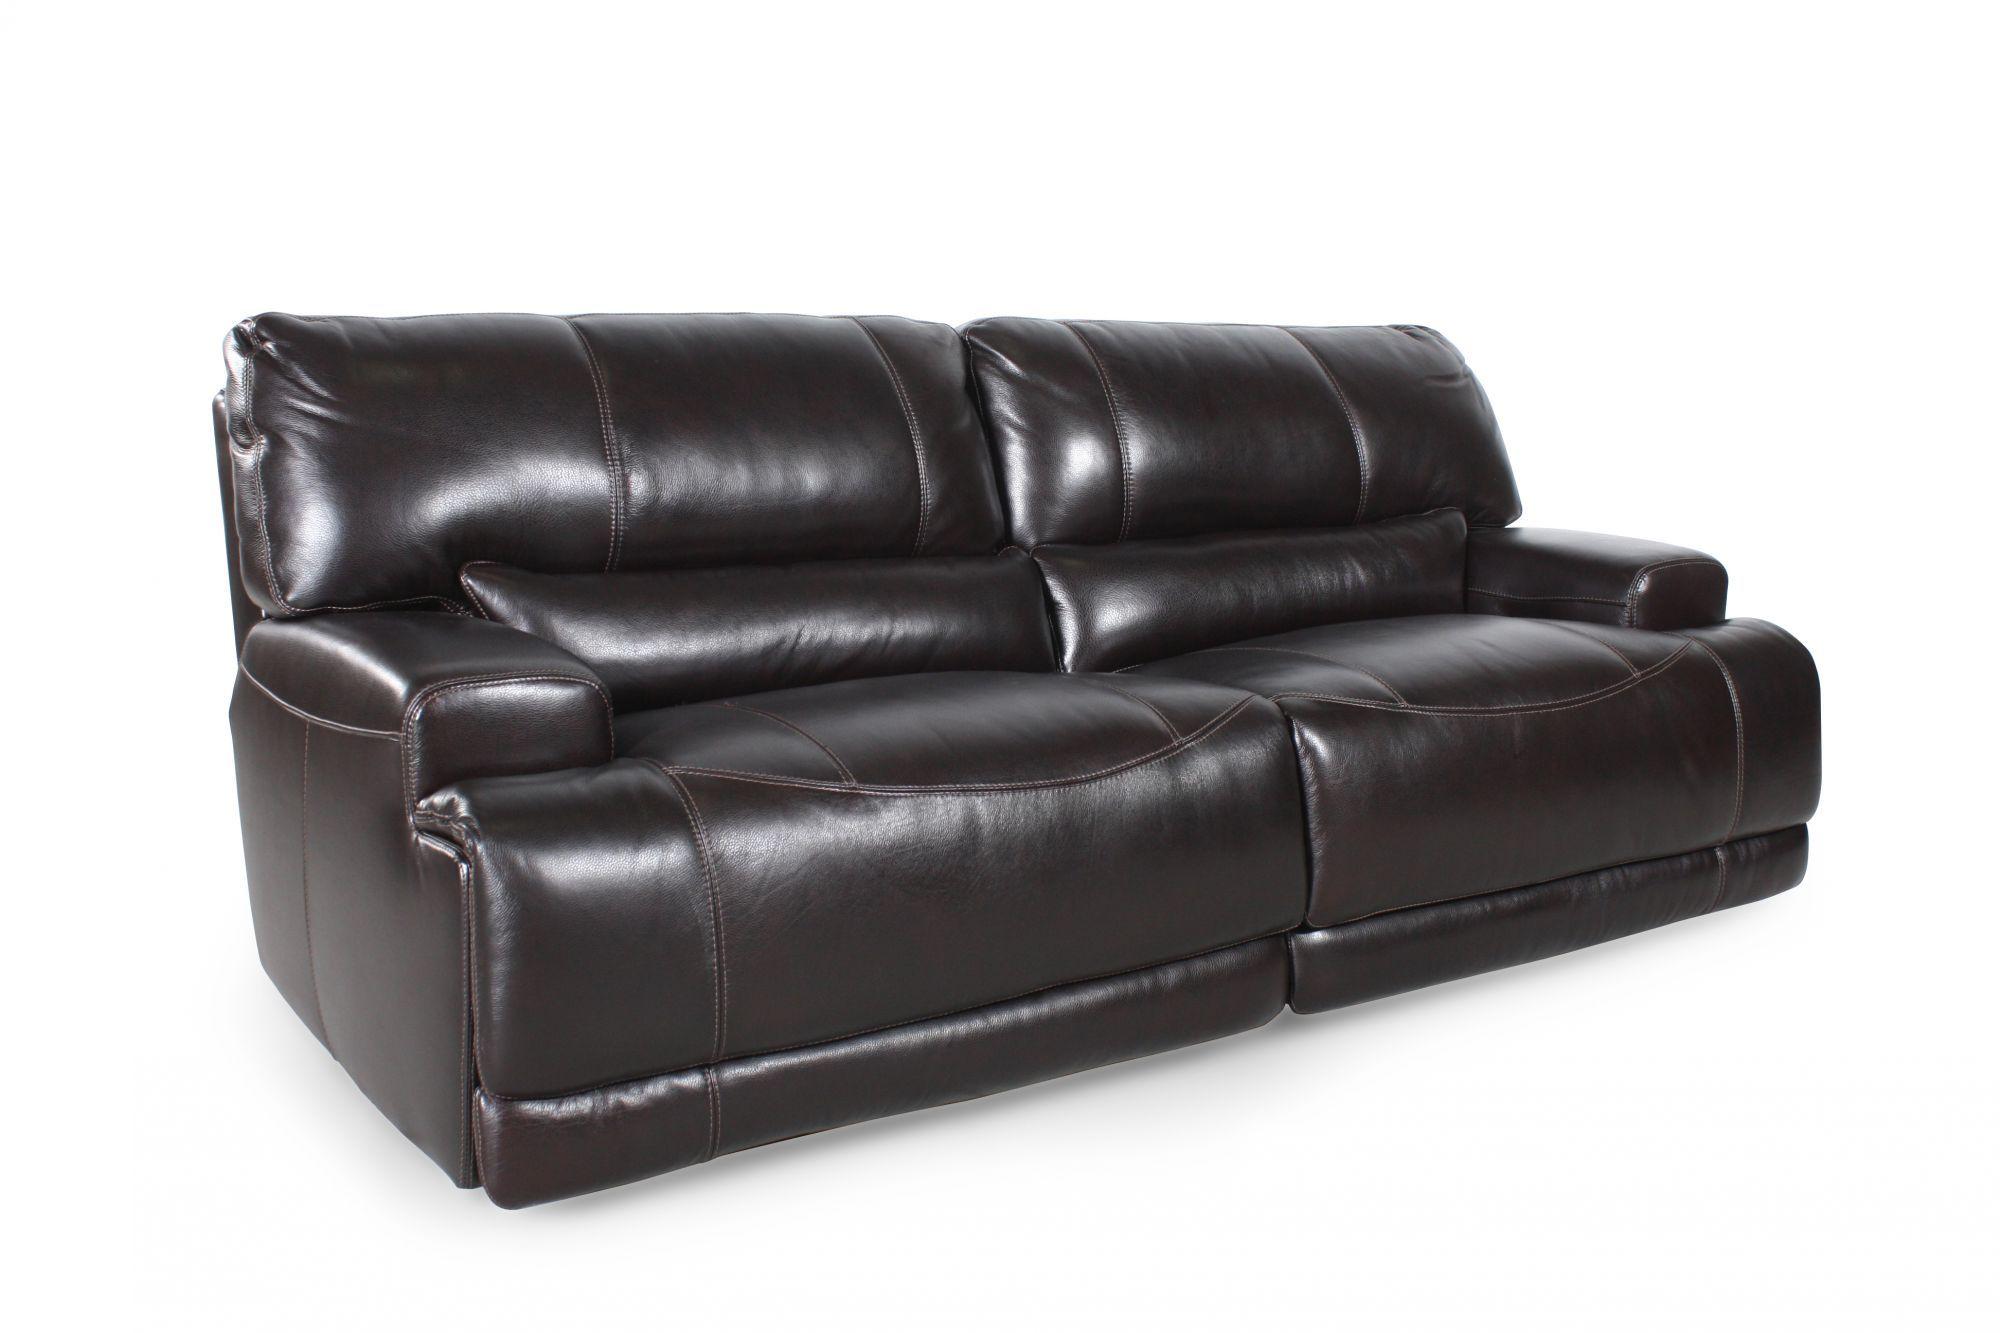 simon li leather longhorn blackberry sofa - Simon Li Furniture